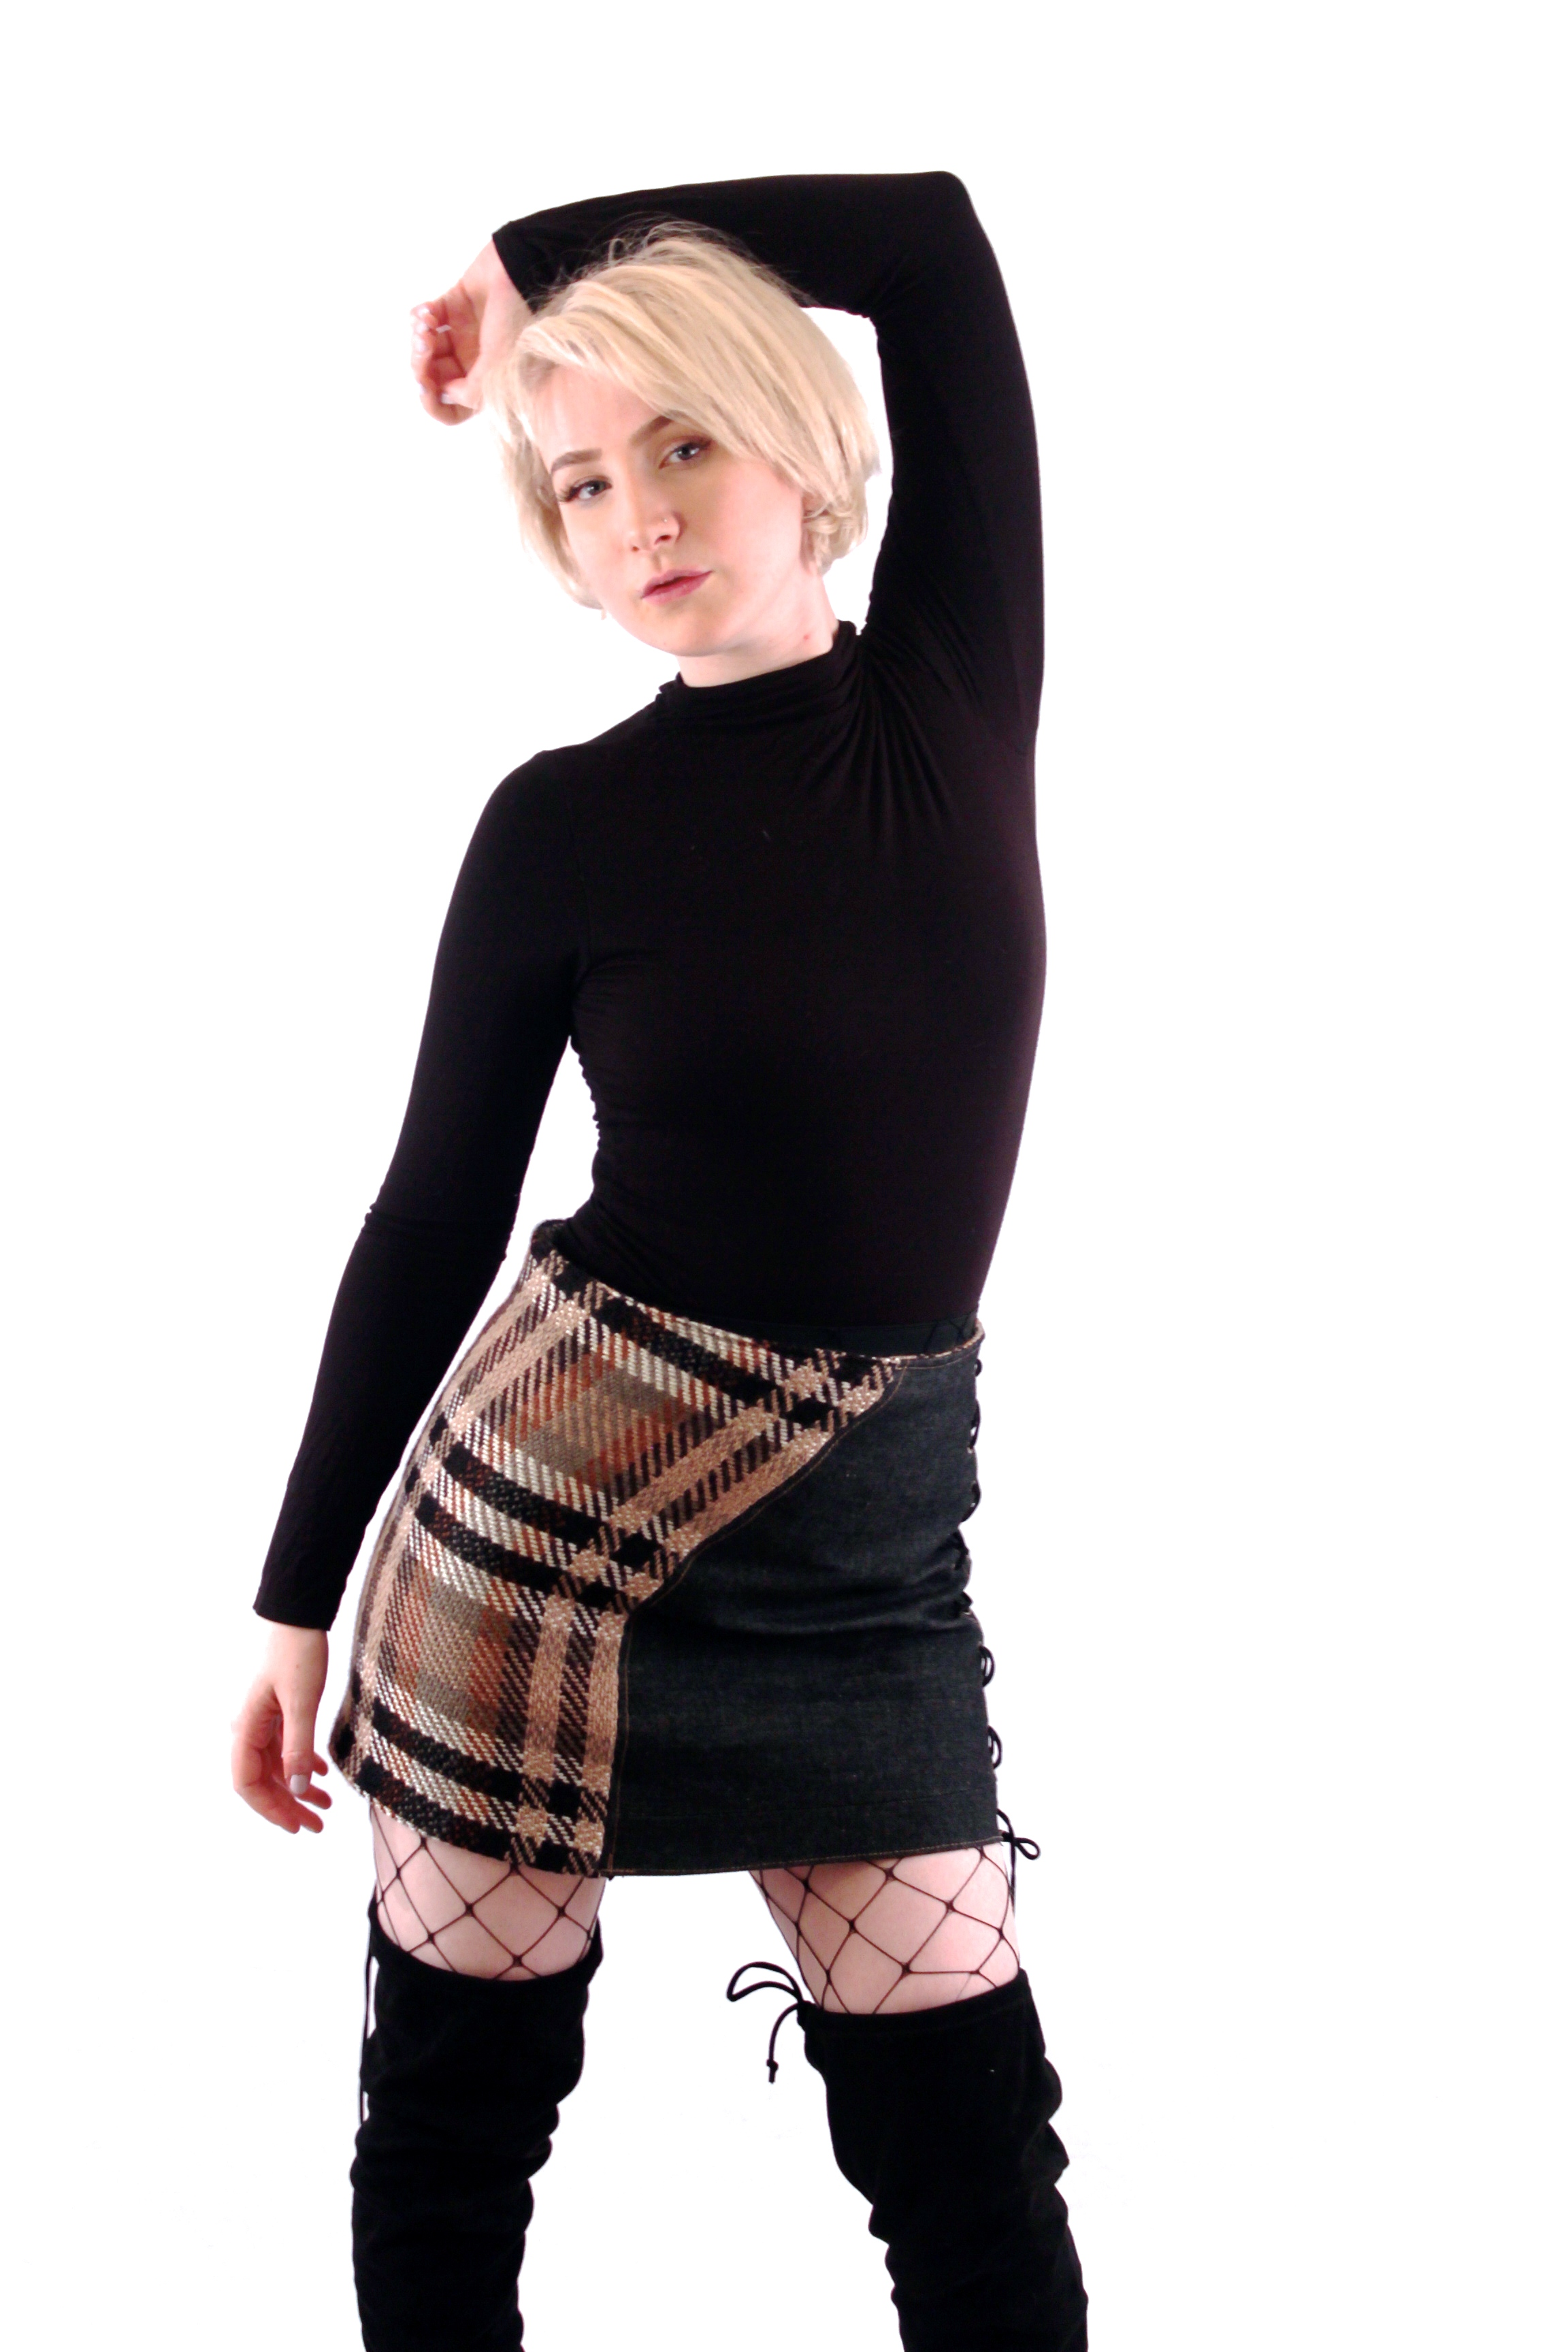 Skirt by Jose Holguin  Model: Emily Chantal